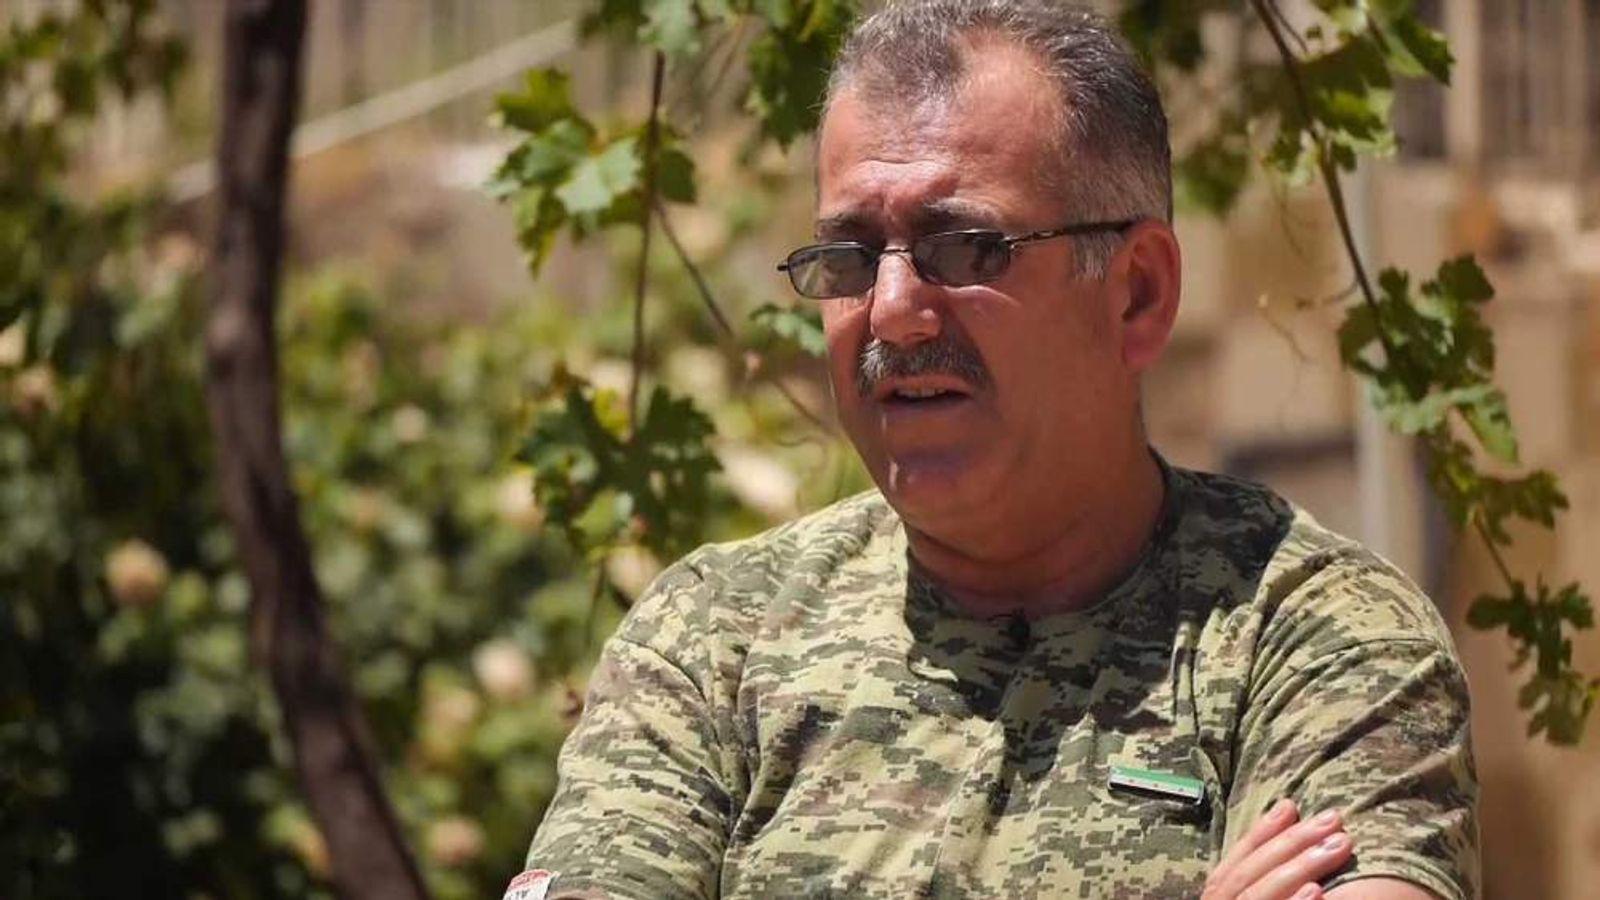 Colonel Abdul al Aygedi, commander of rebel forces in Aleppo, Syria